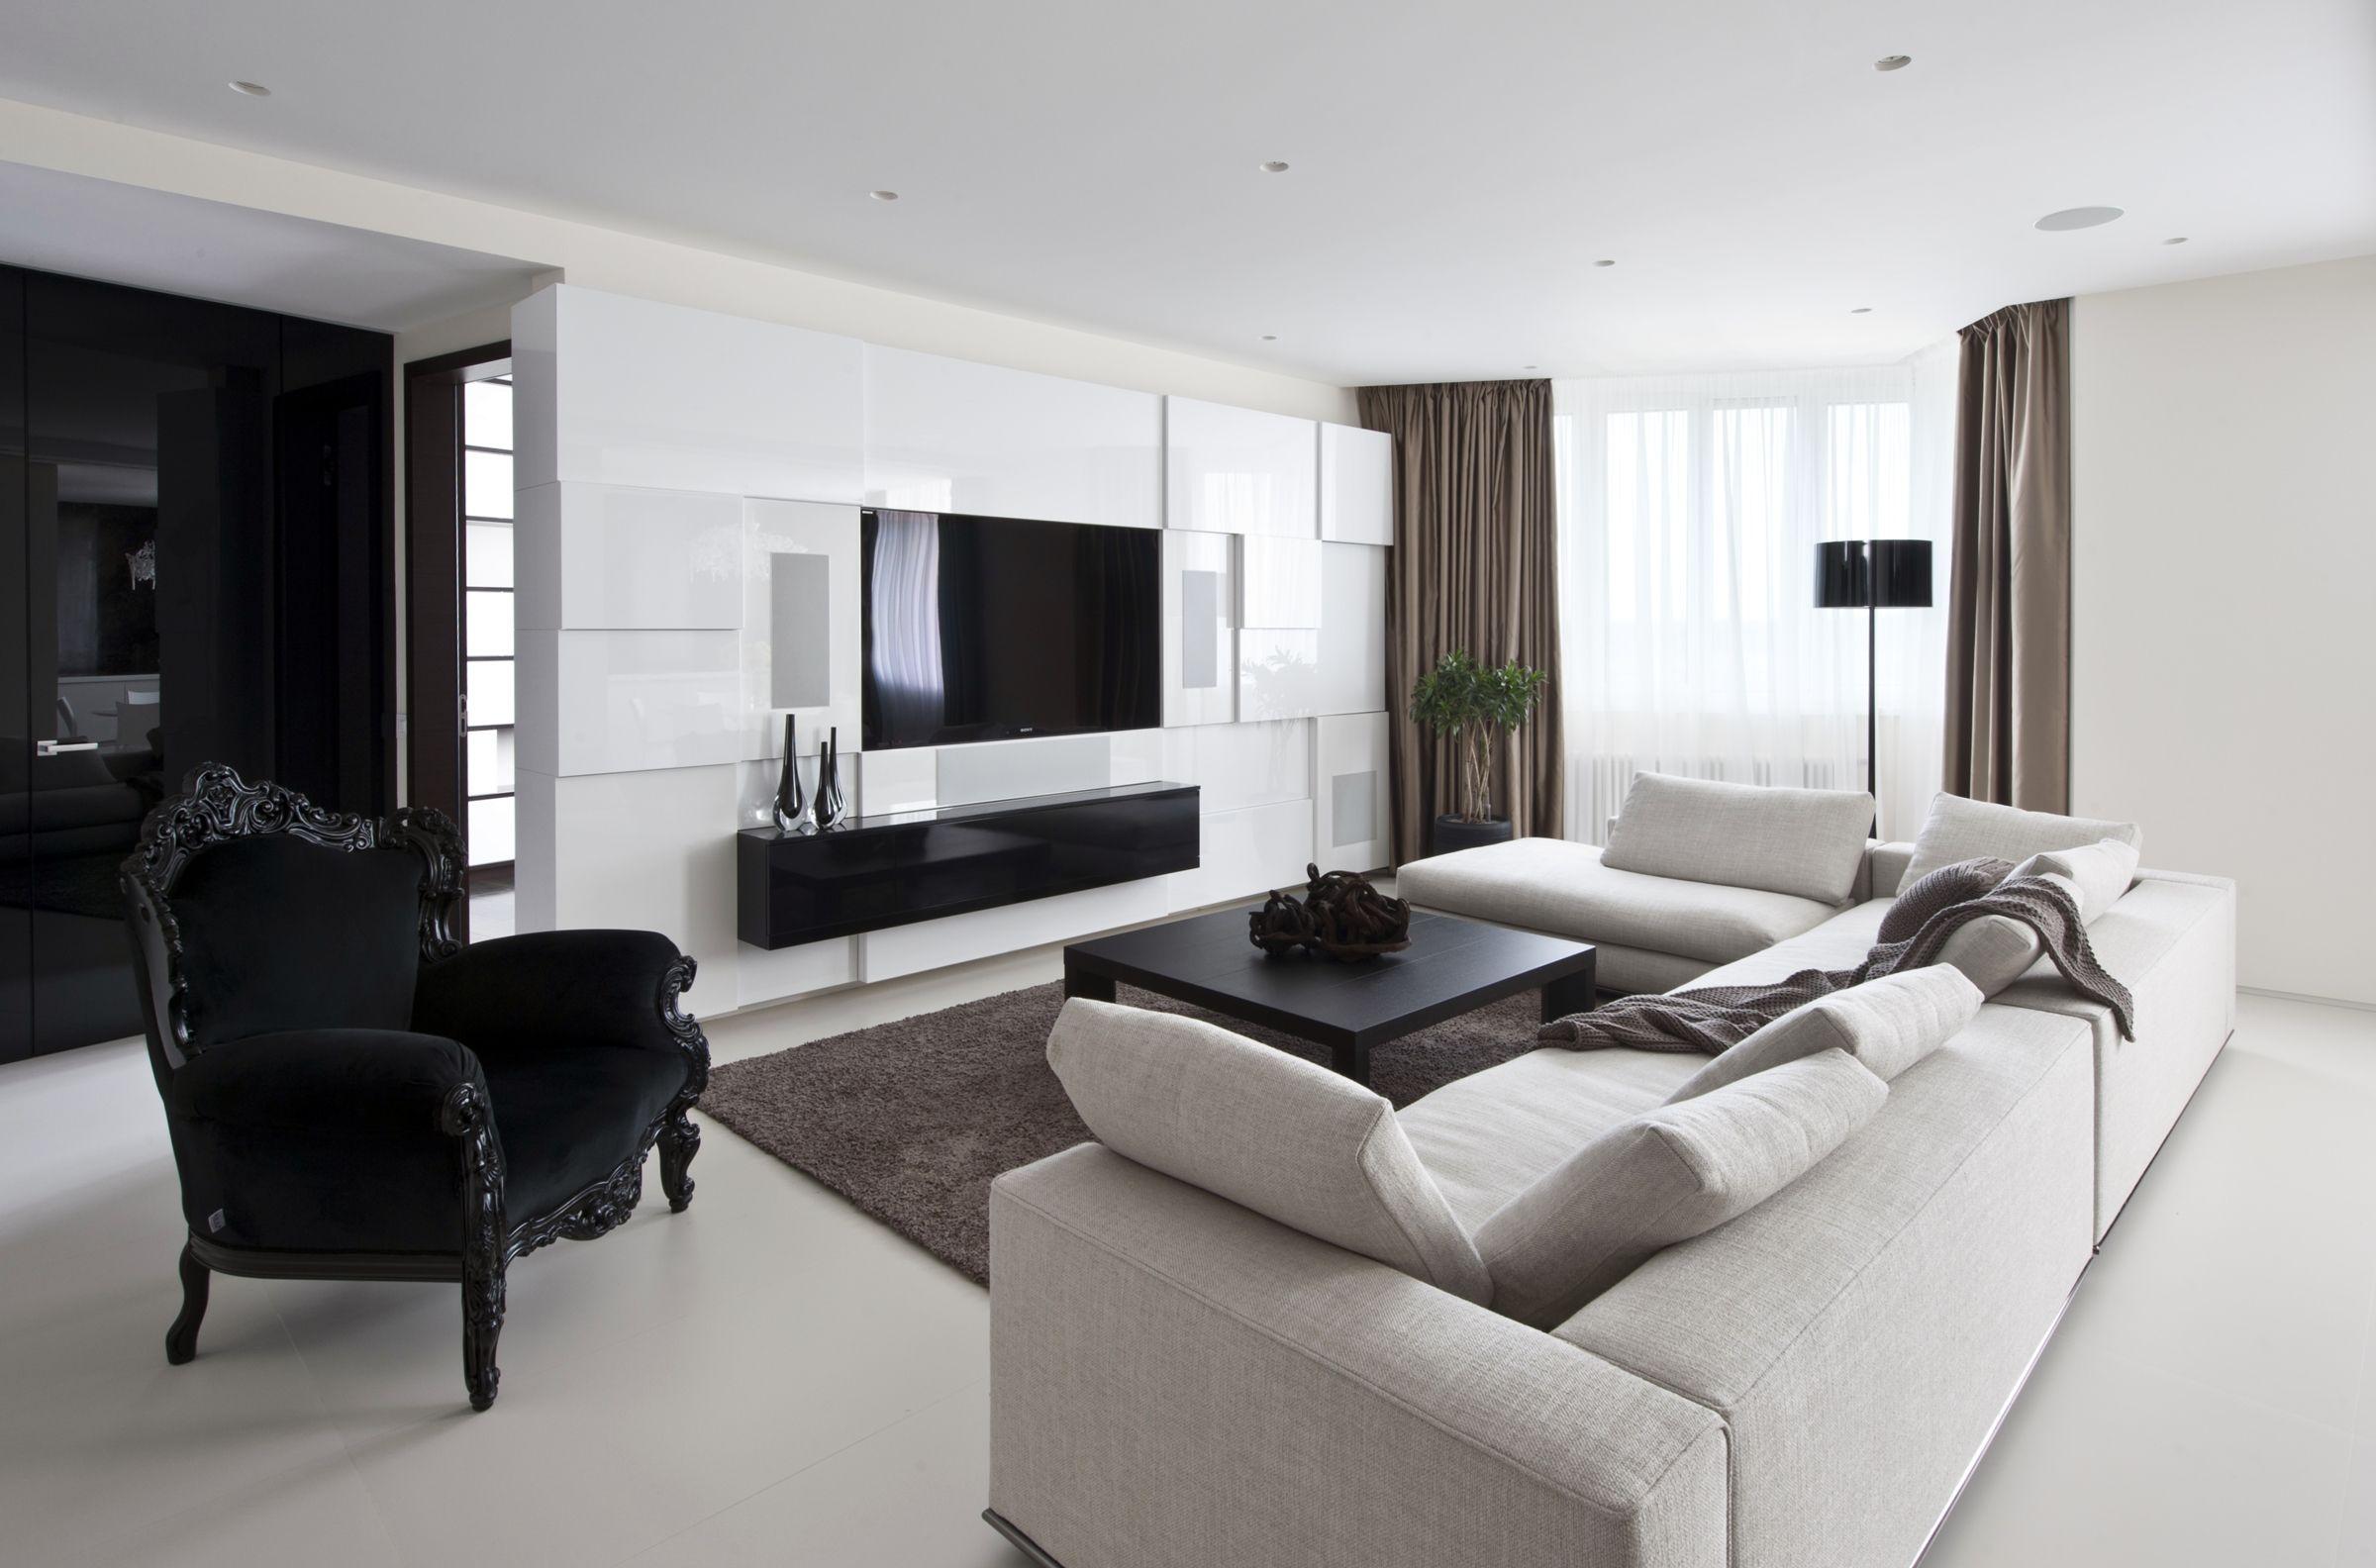 Decoration Apartment apartment decorating ideasalexandra fedorova | ebene villa